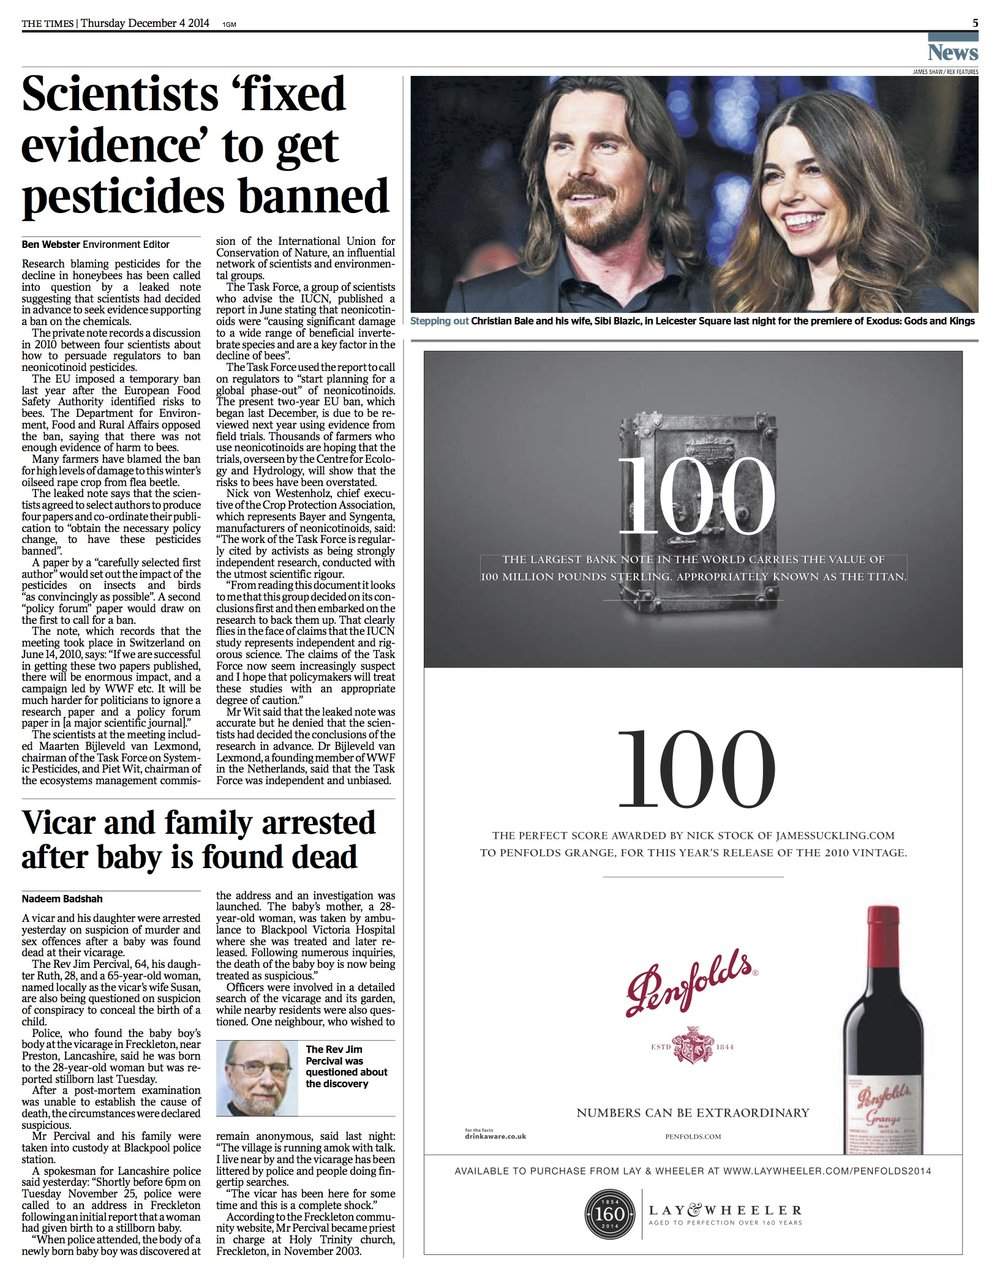 Christian Bale The Times.jpg